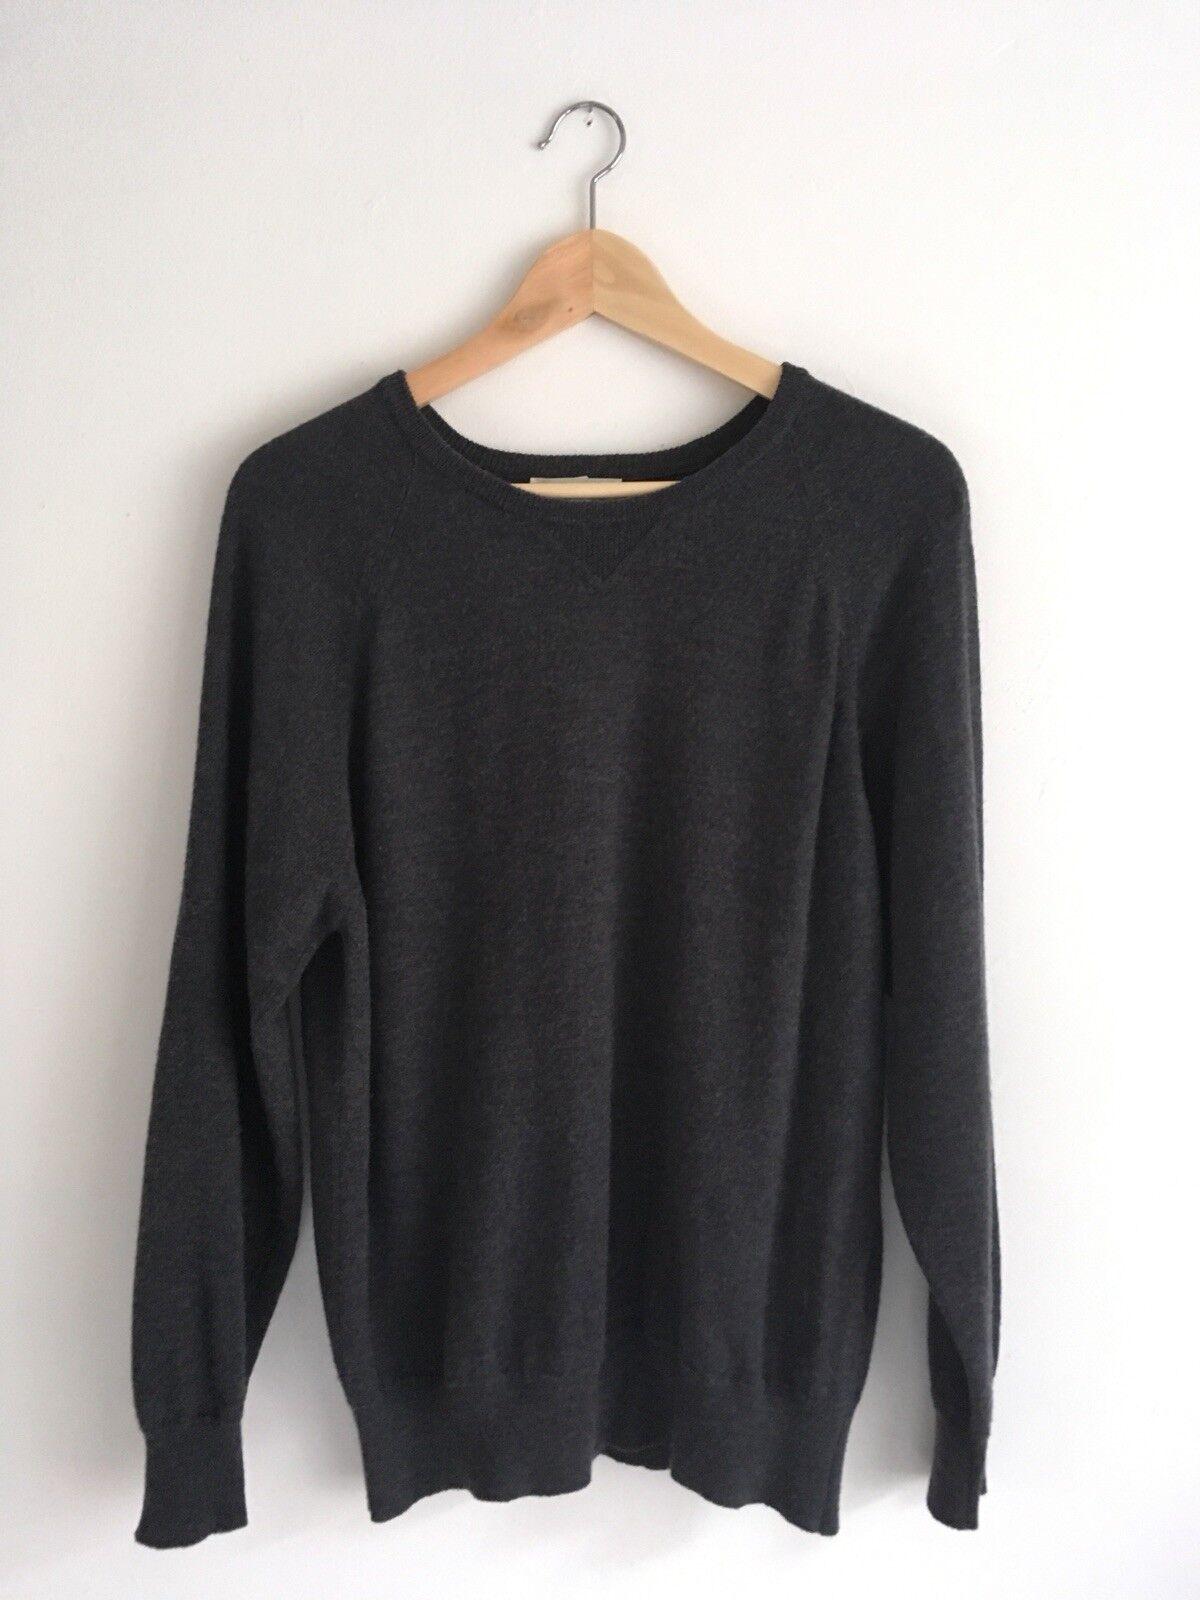 Freemans Sporting Club & Scott & Charters Merino Wool Charcoal Sweater Größe 46